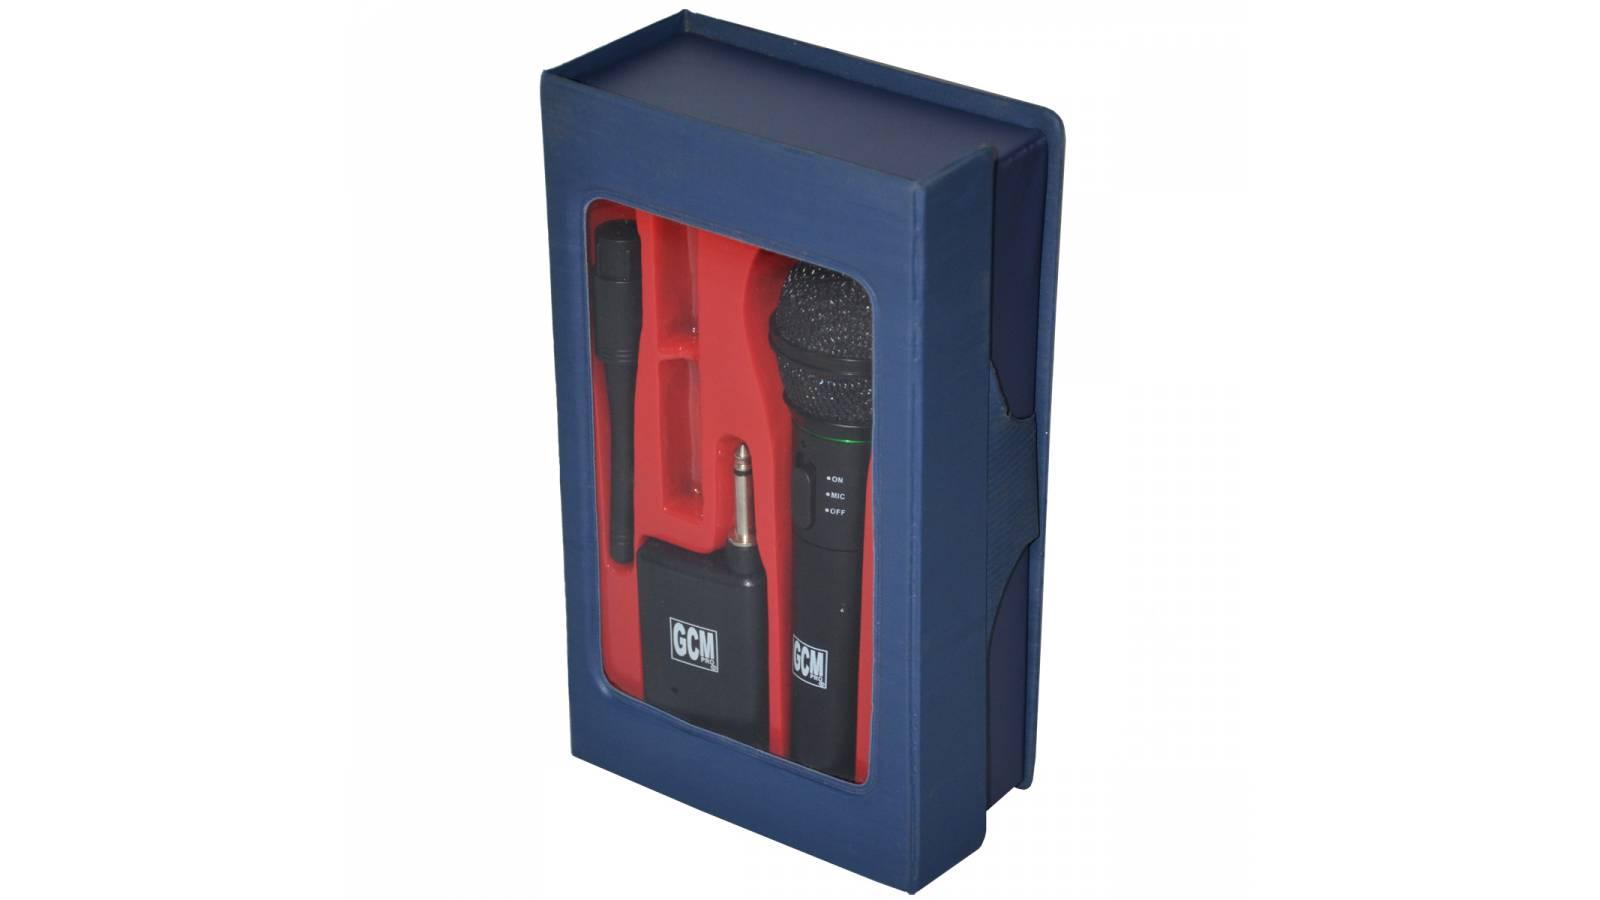 Micrófono Inalambrico GCM-308 o Cableado Color Negro Calidad A GcmPro